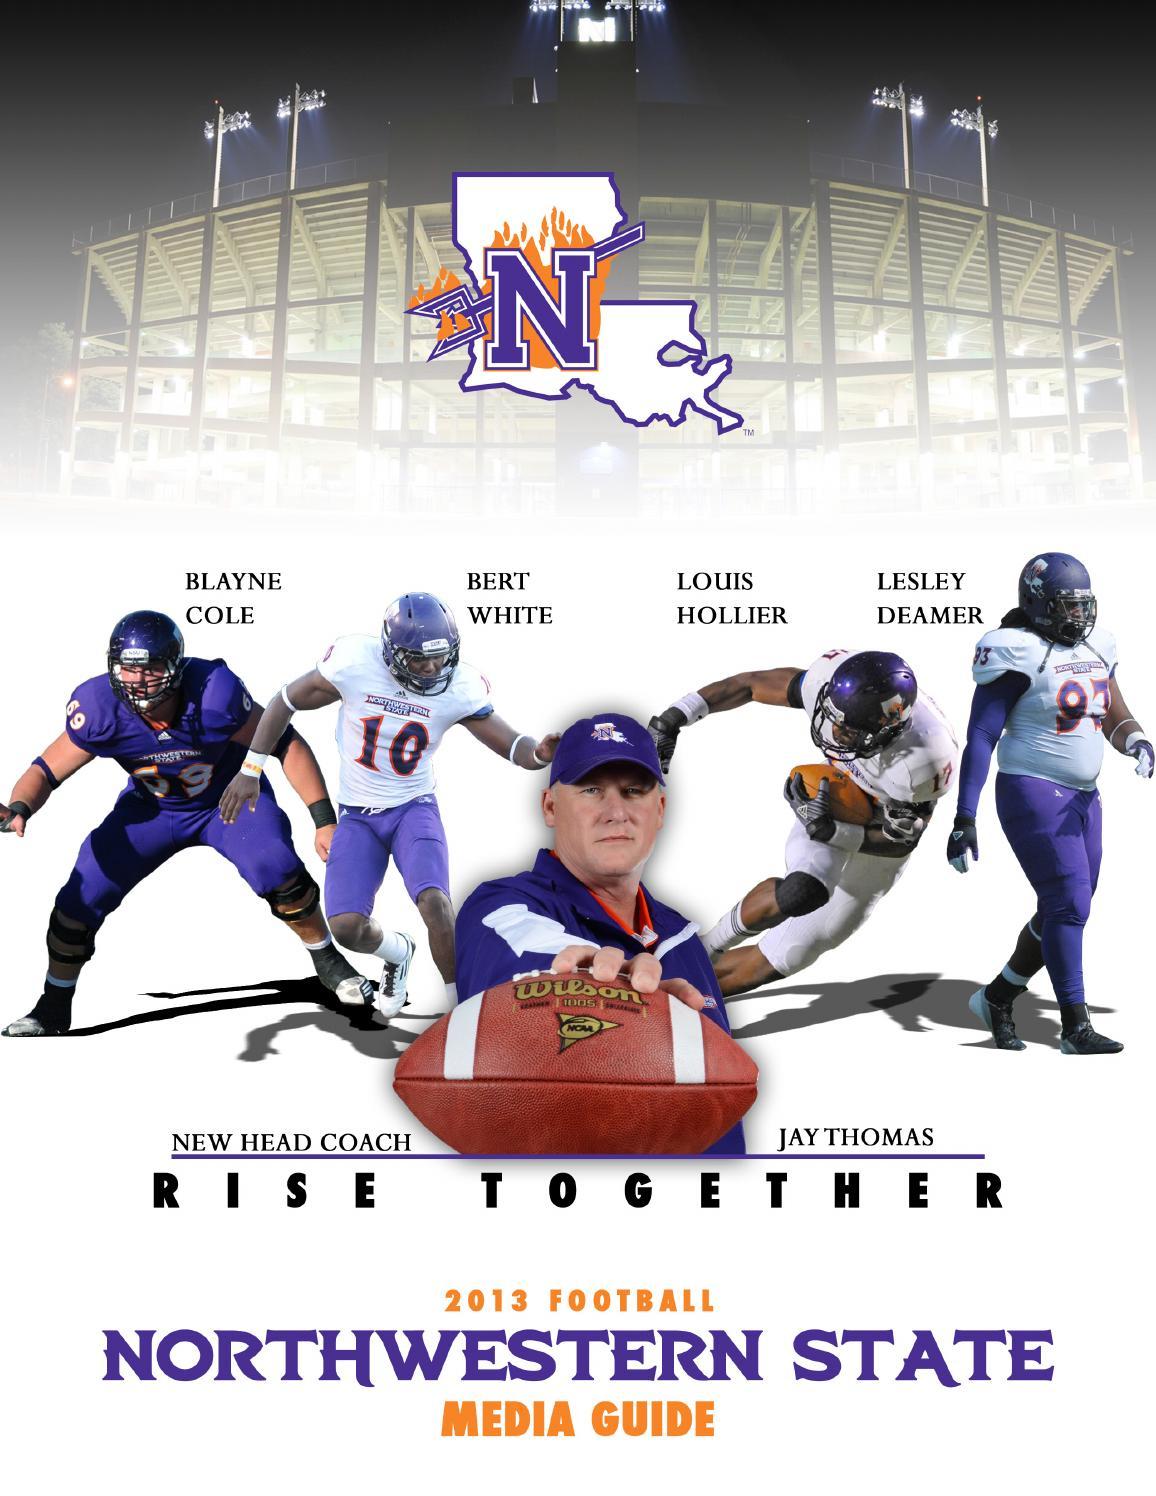 2013 Northwestern State Football Media Guide by Matthew